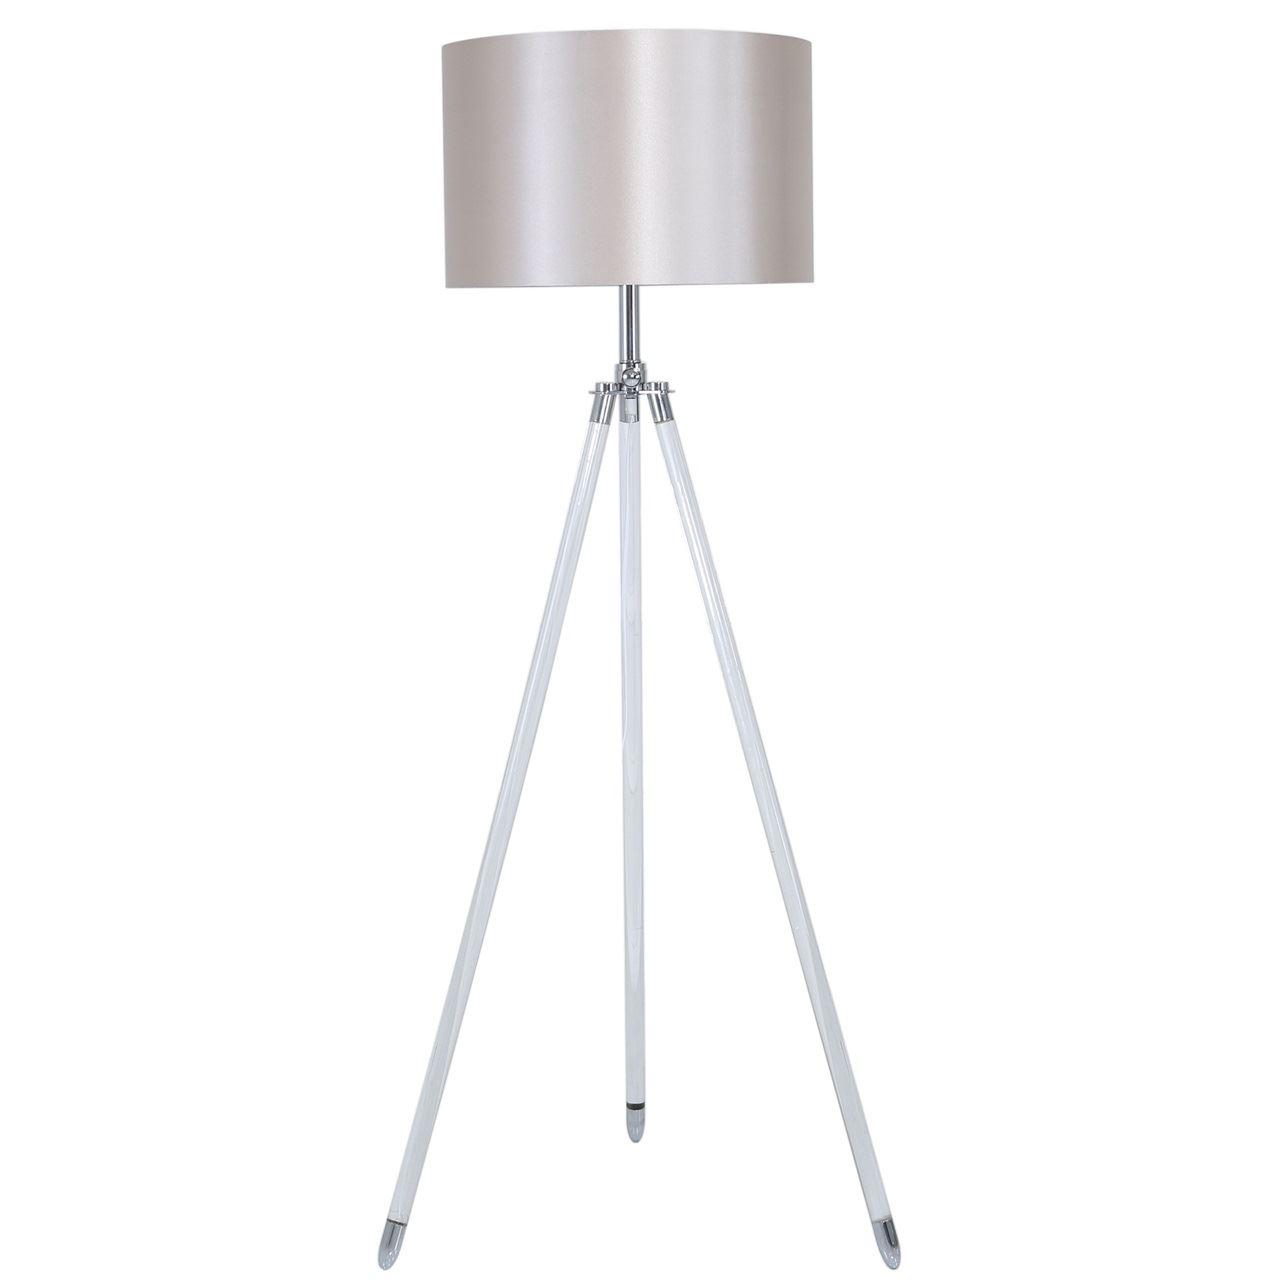 Acrylic Tripod Floor Lamp With Blush Pink Shade